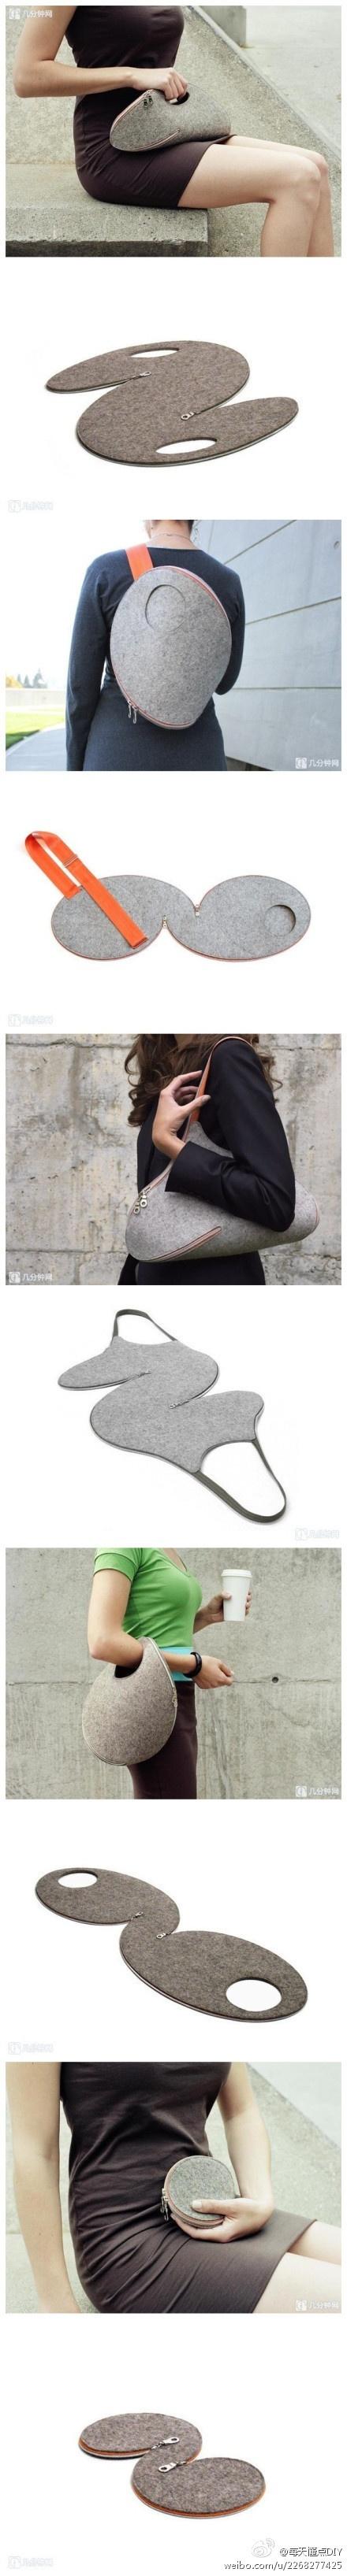 purse designs